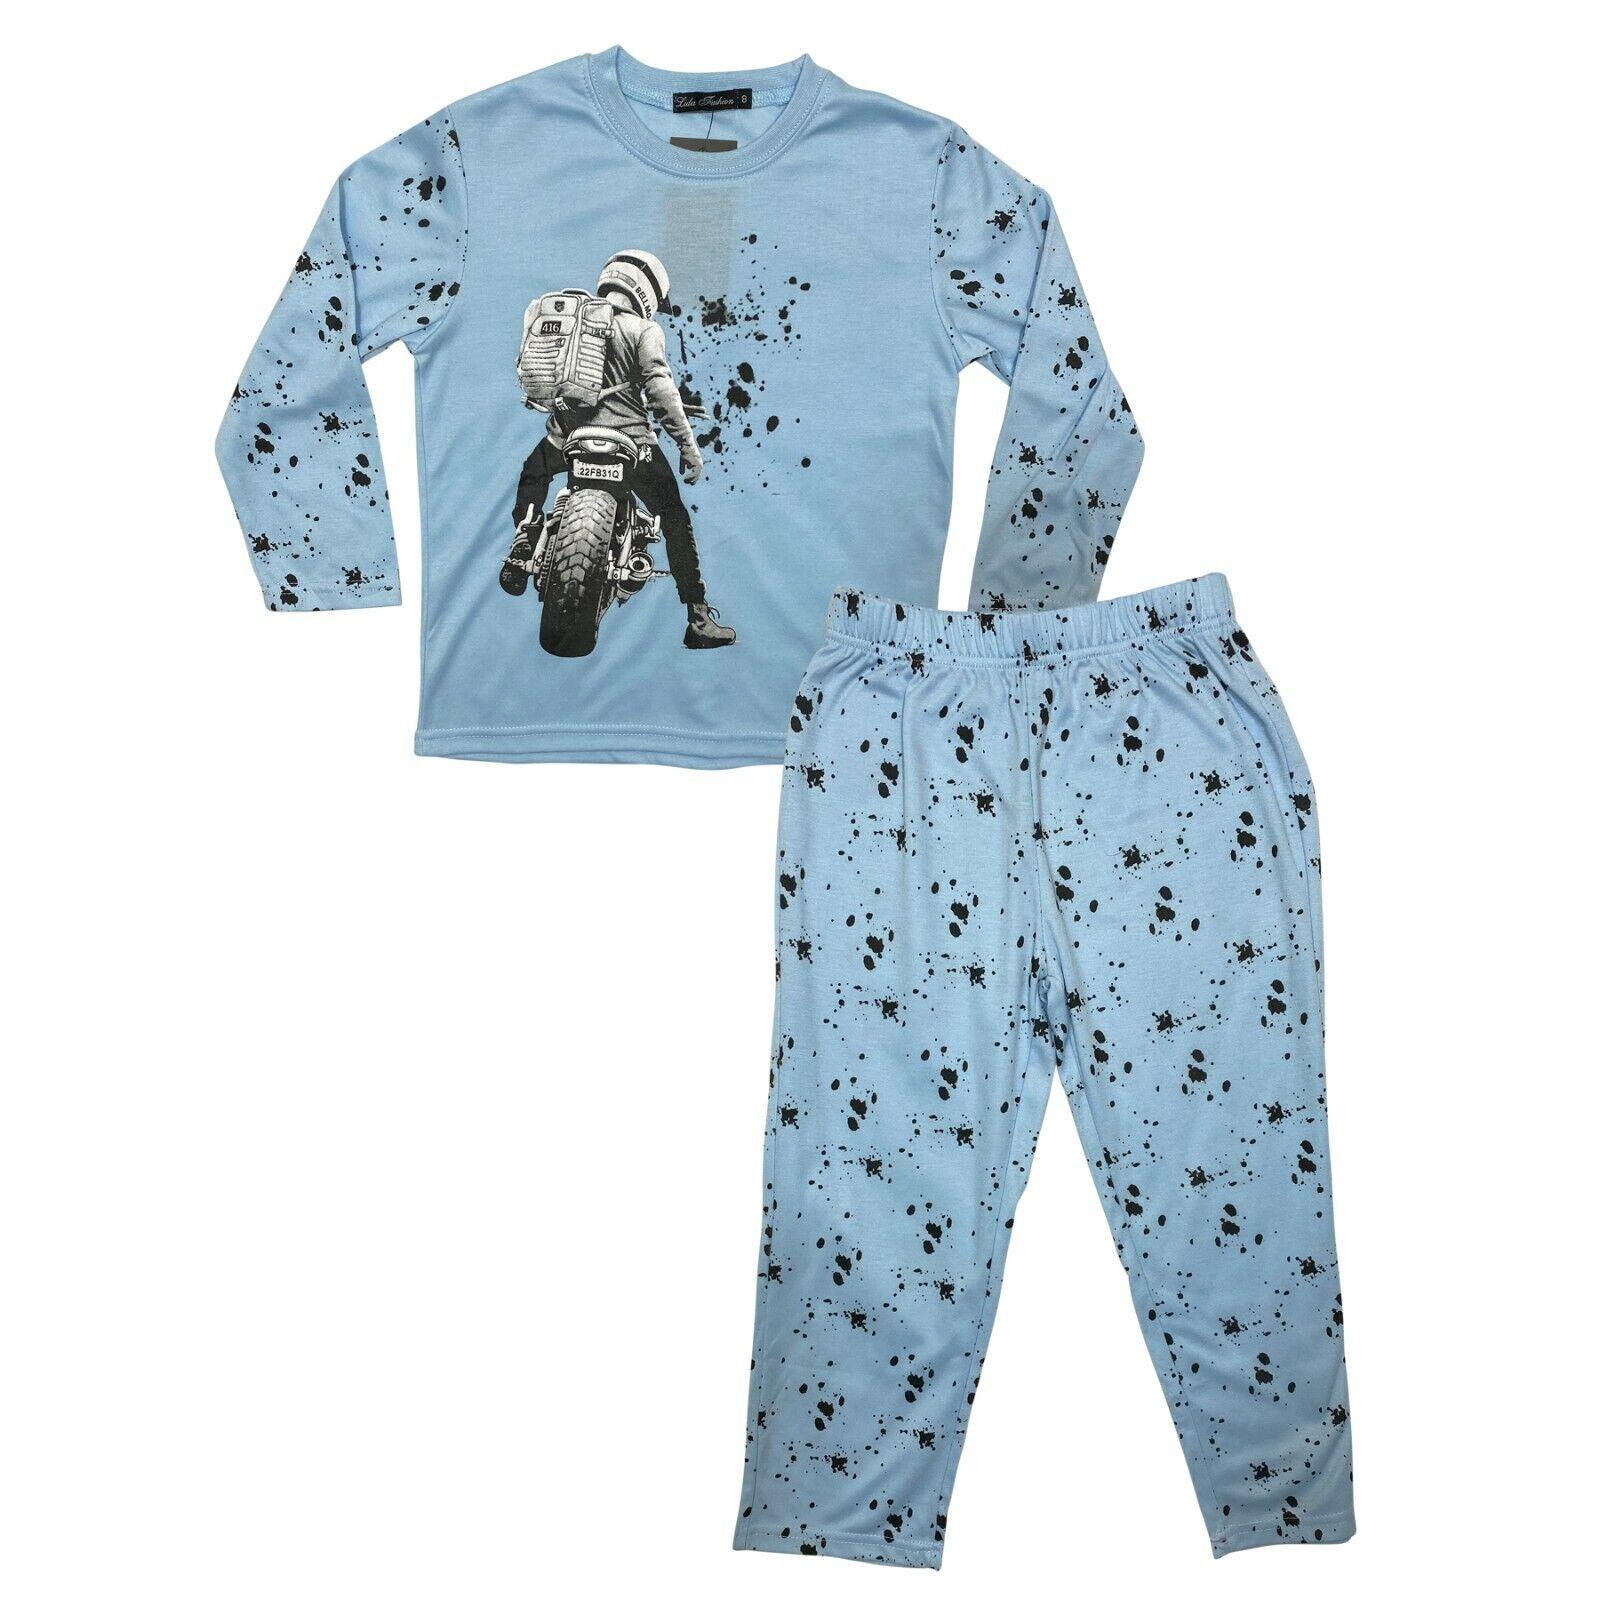 5T NWT  BoxL Boys Hot Wheels Cars 2 Piece Pajama Set Tee /& Long Pant Pj/'s 2T